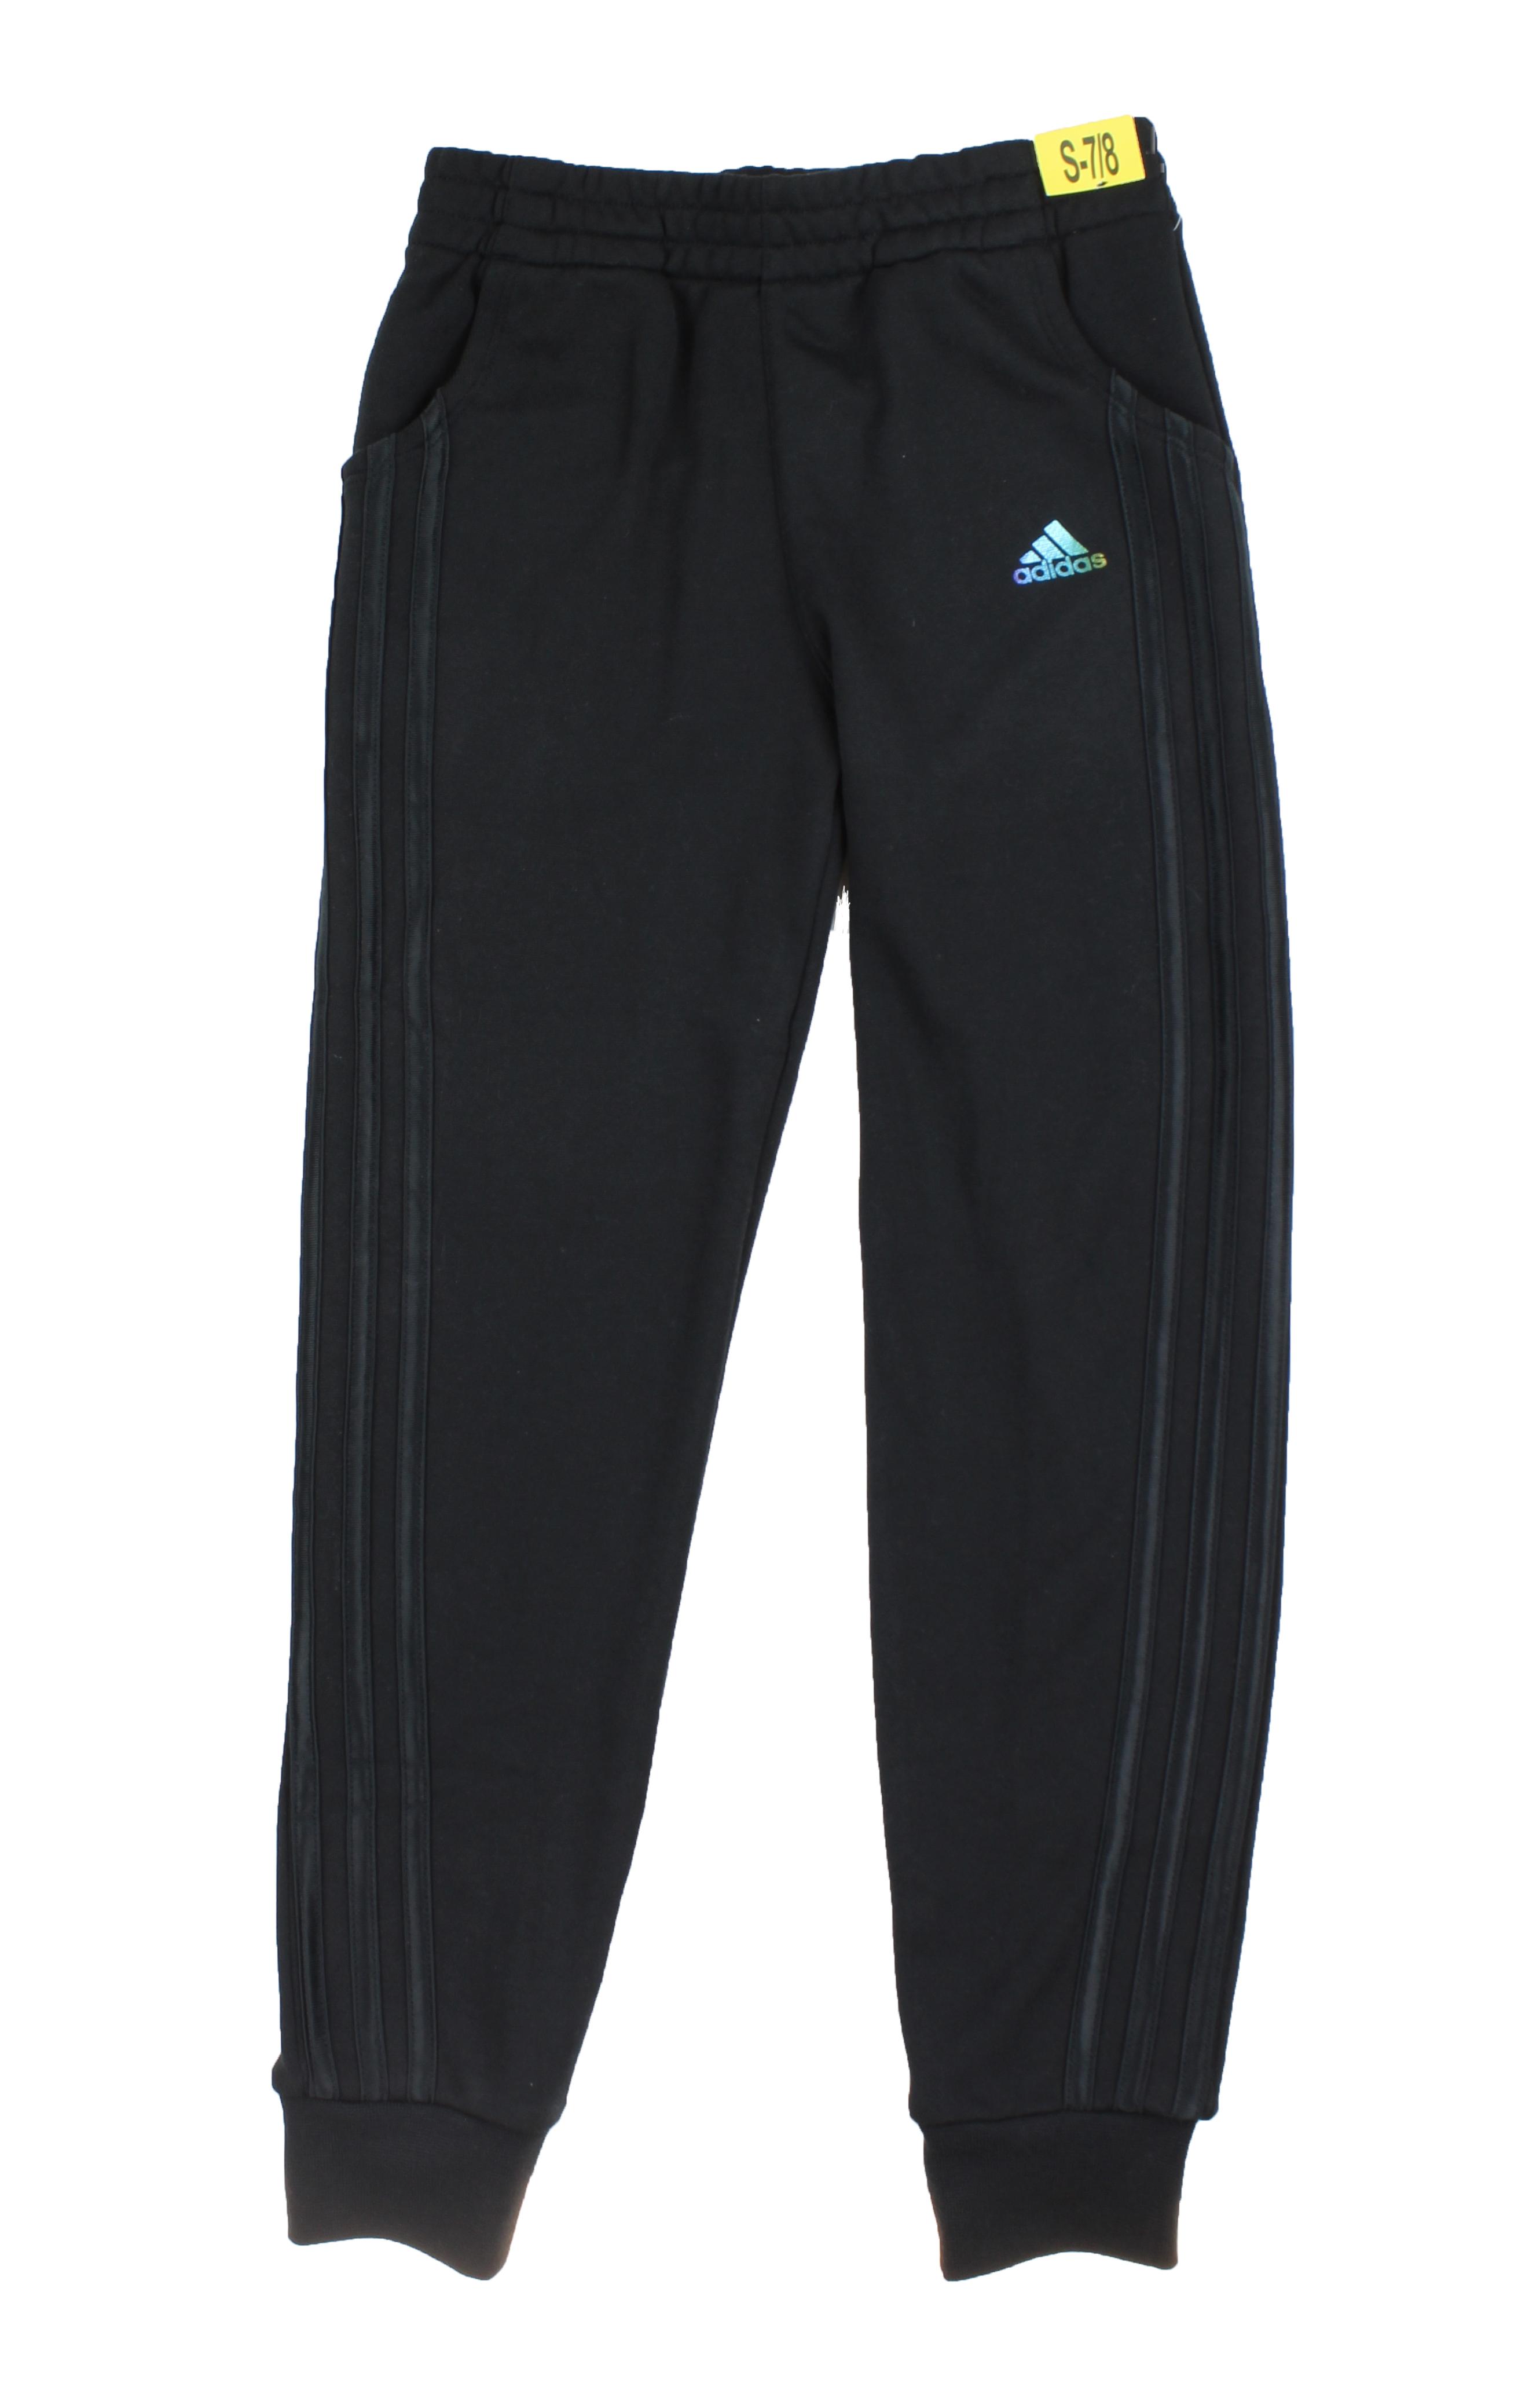 Acquisti Online 2 Sconti su Qualsiasi Caso jogging adidas